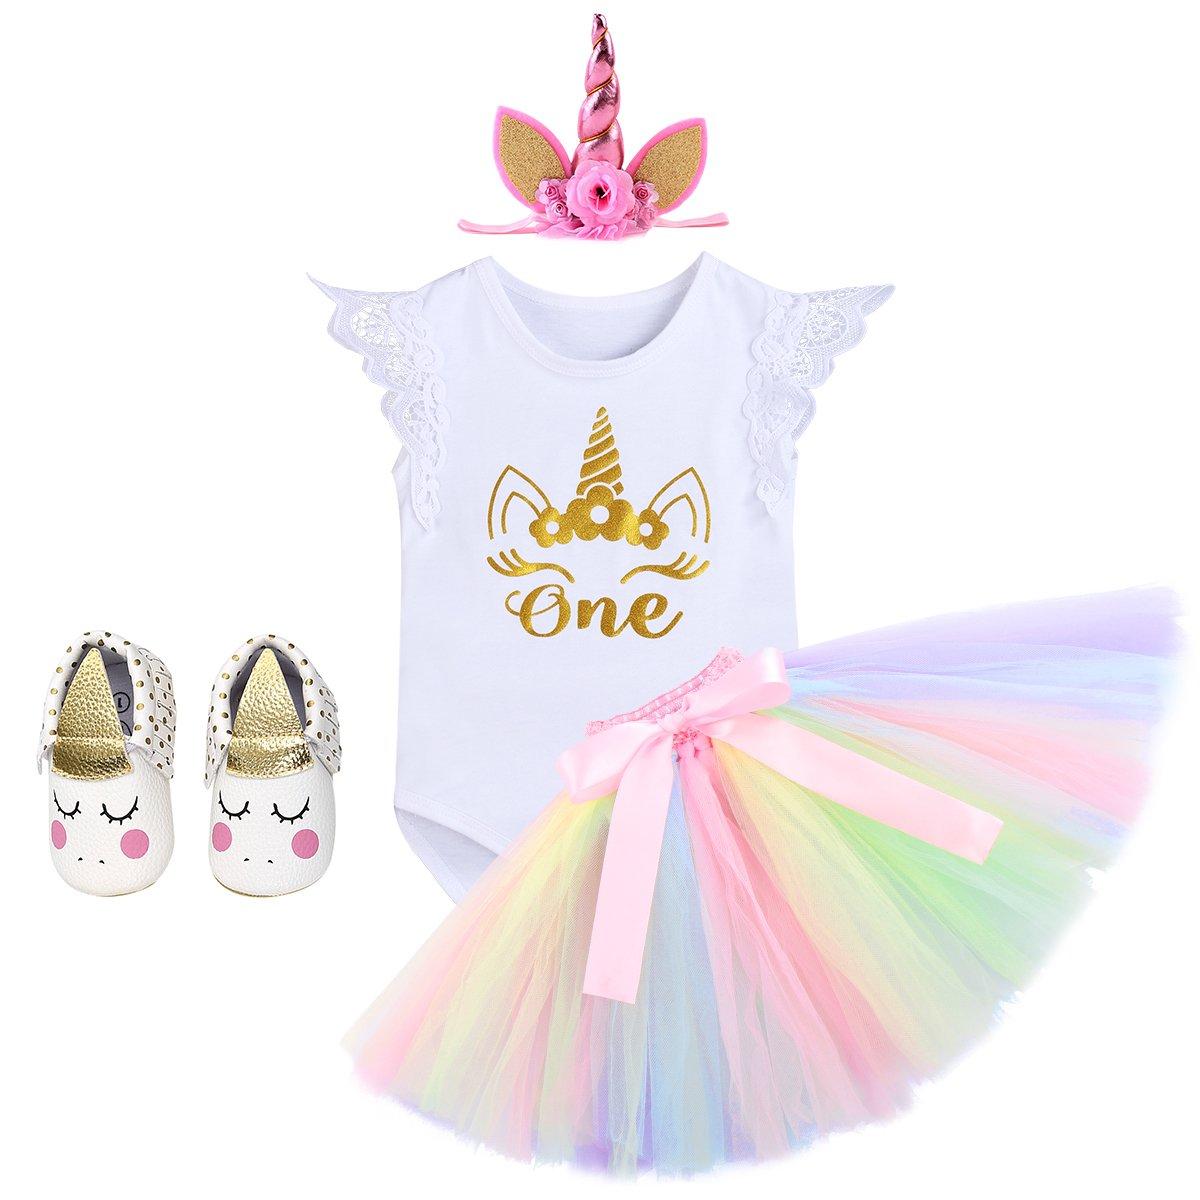 IMEKIS Unicorn Cake Smash Outfits Baby Girls 1st Birthday Romper Tutu Skirt Set